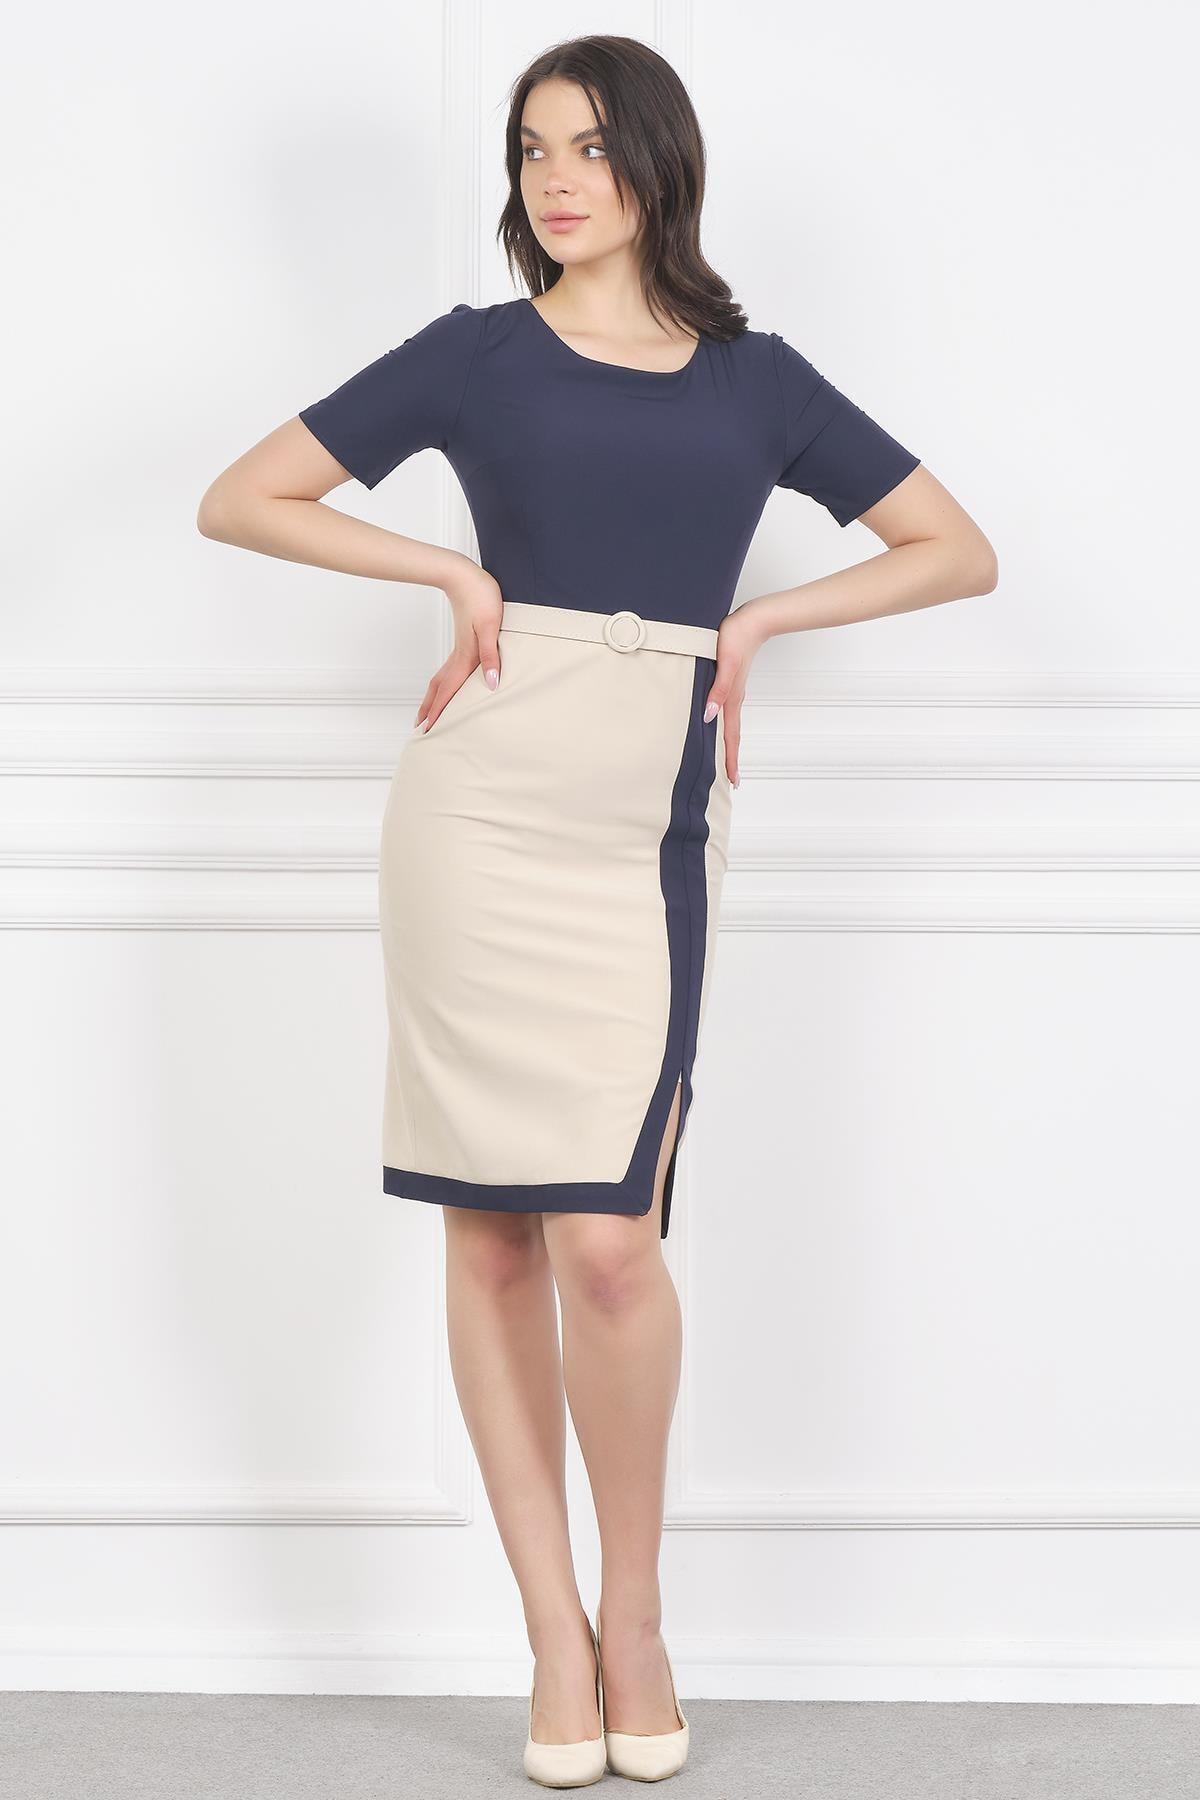 Shahiqa Çift Renkli Kemerli Şık Ofis Elbise 1